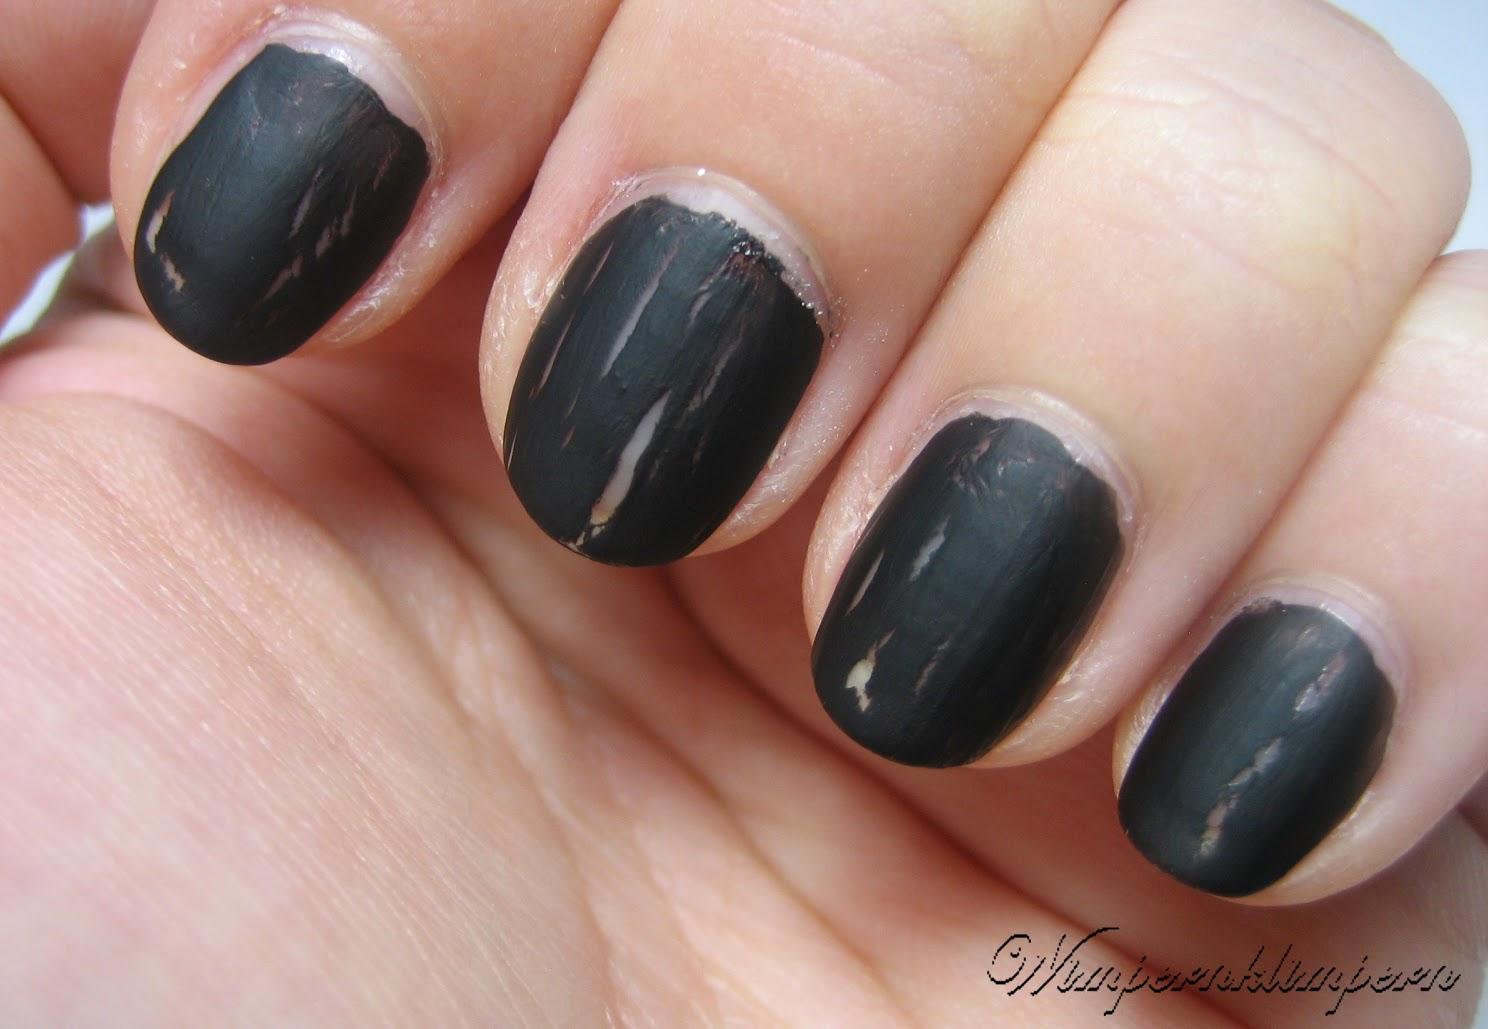 Ciaté Chalkboard Manicure 1. Schicht